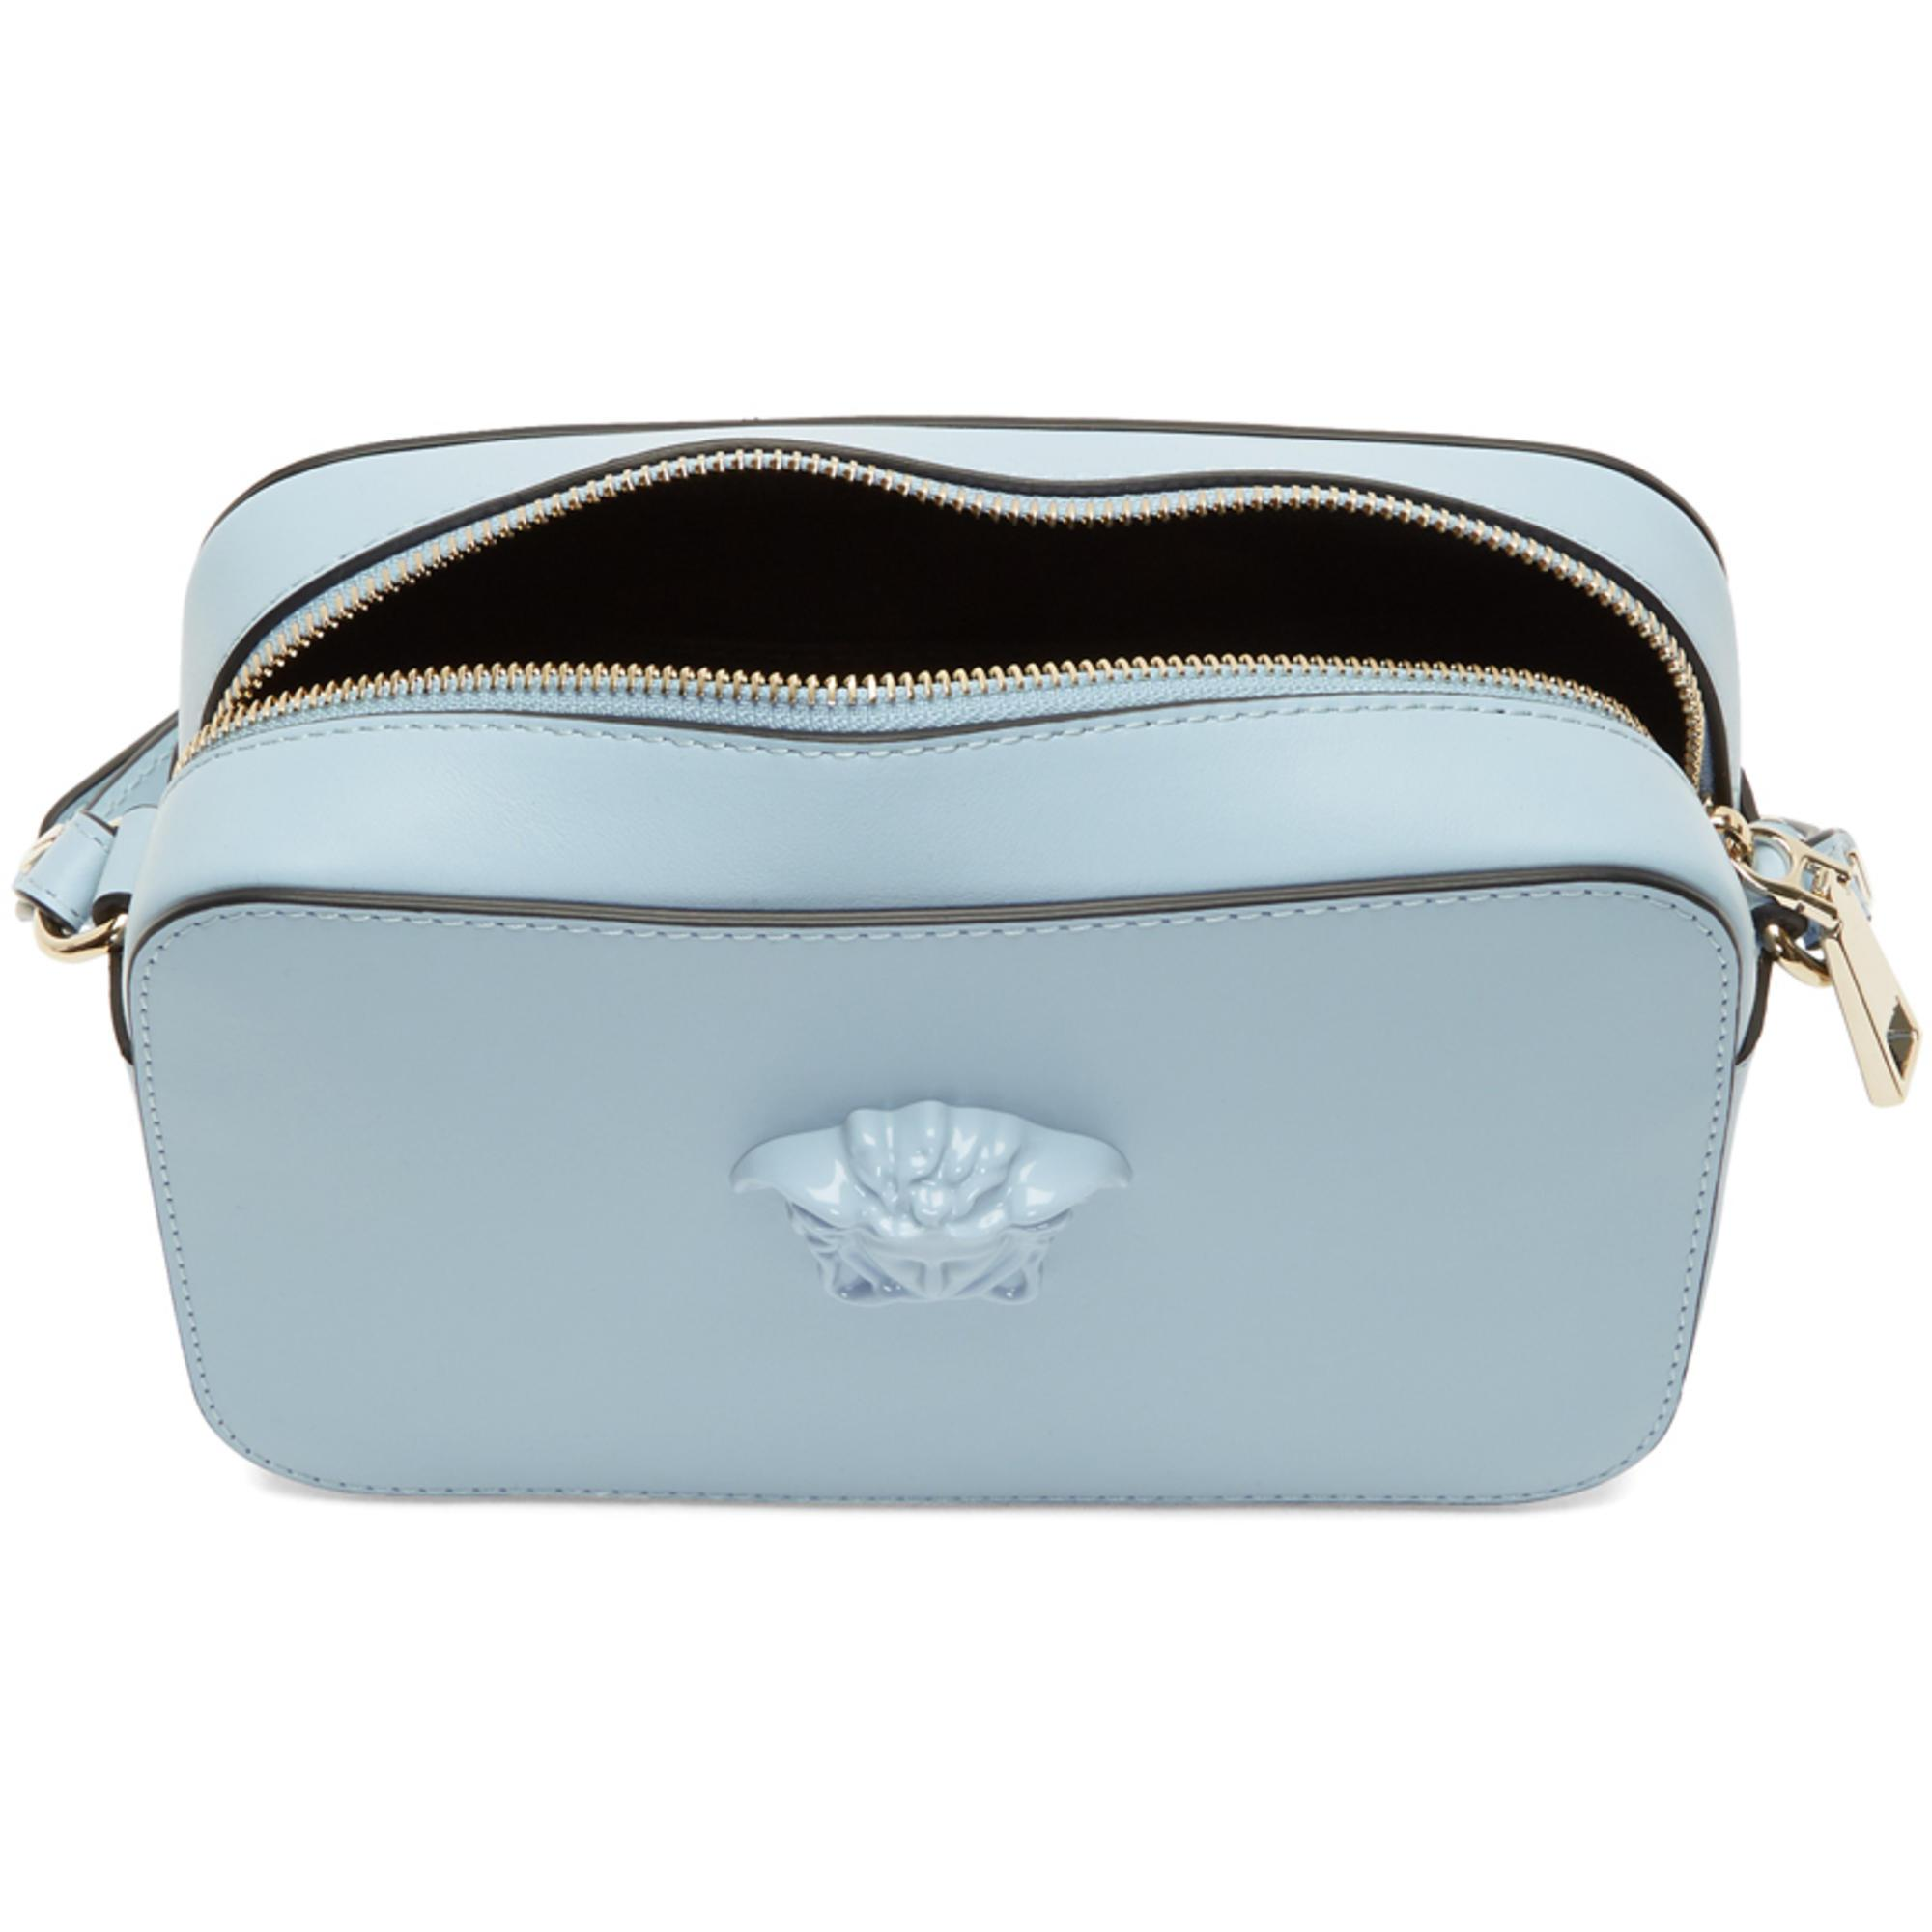 6e48884289 Lyst - Versace Blue Medusa Camera Bag in Blue